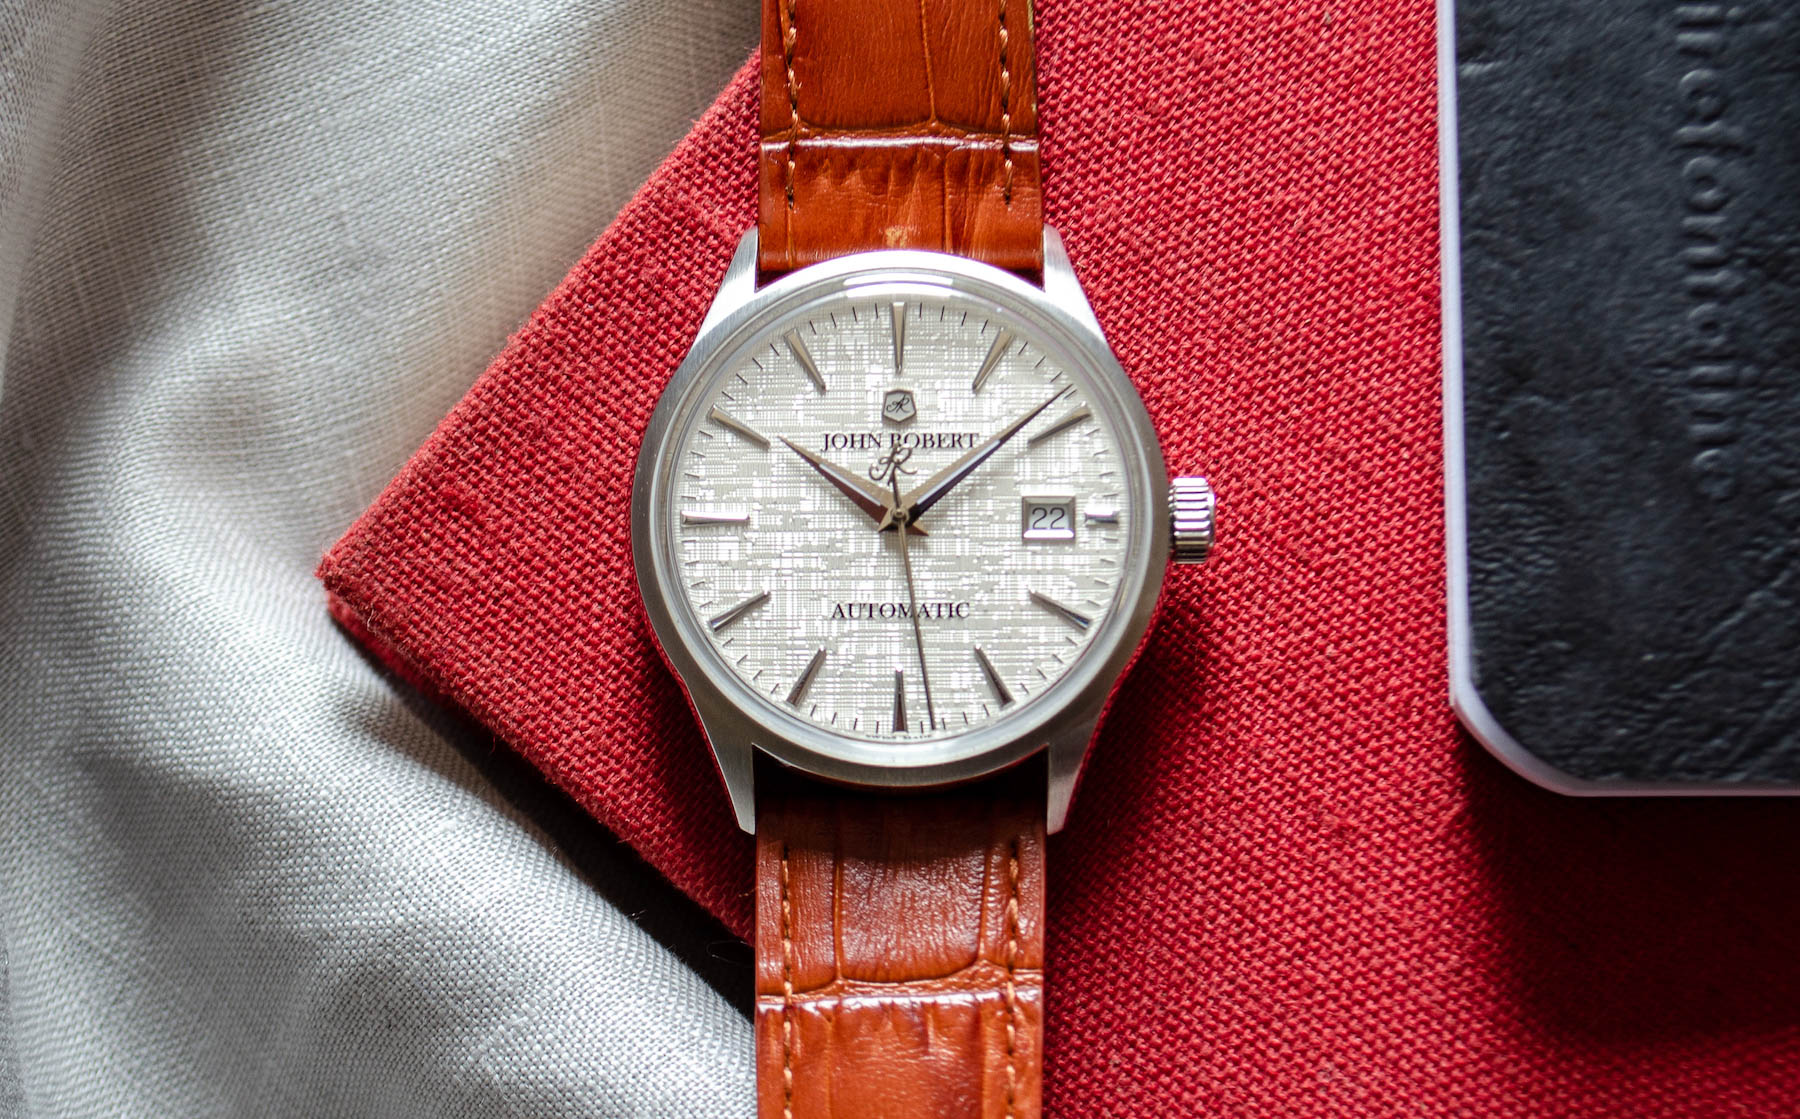 John Robert Wristwatches Archetype